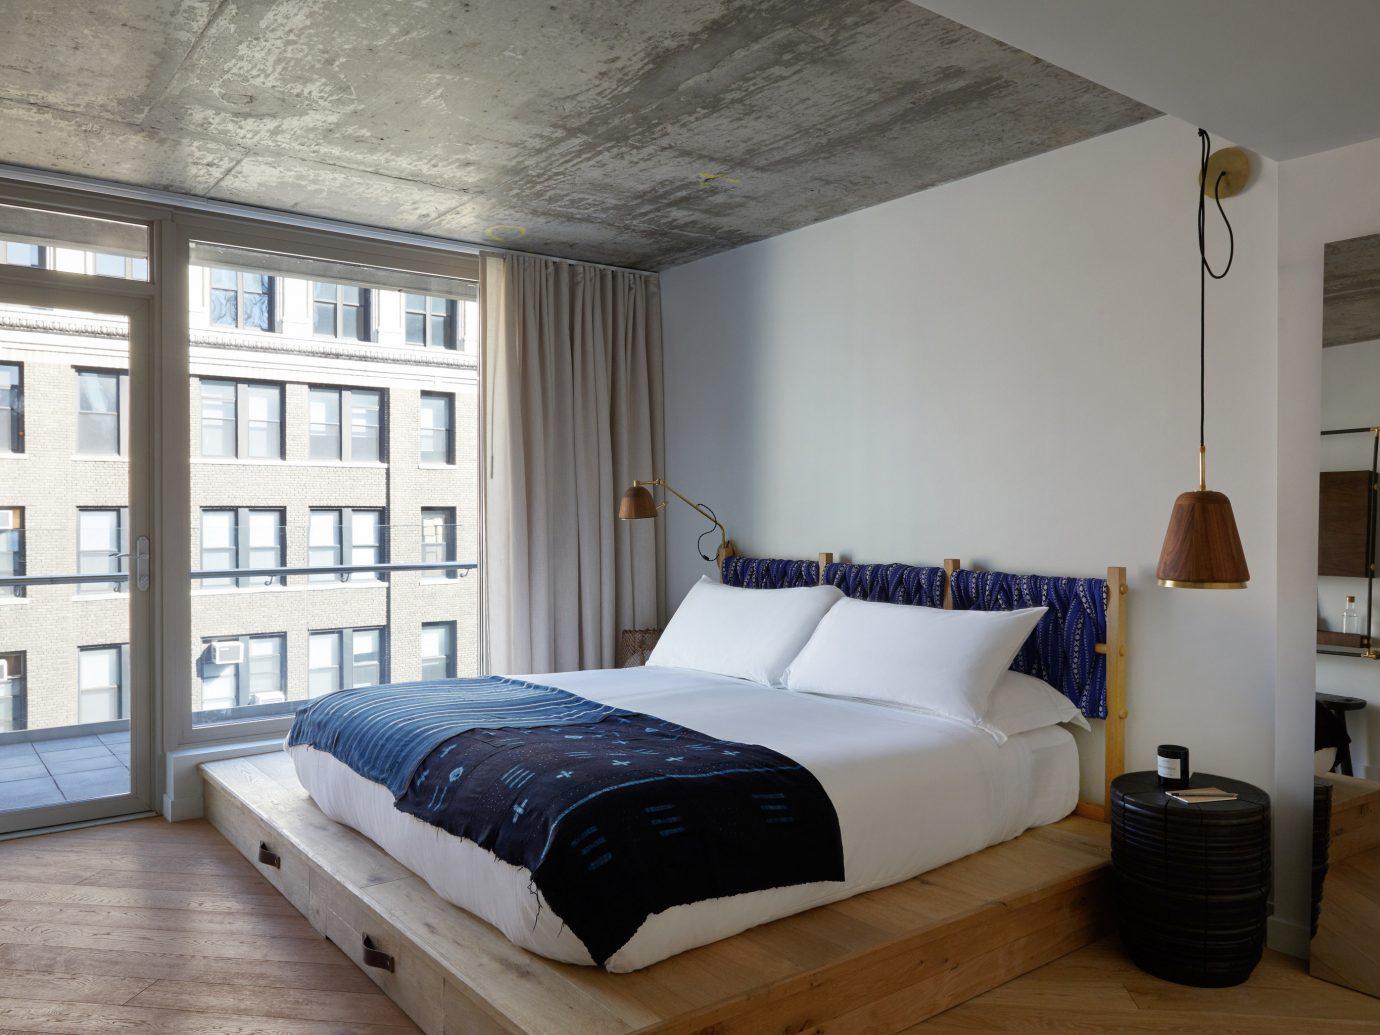 Hotels indoor wall floor room bed ceiling bed frame interior design Architecture Bedroom home window mattress furniture loft daylighting interior designer Suite hotel